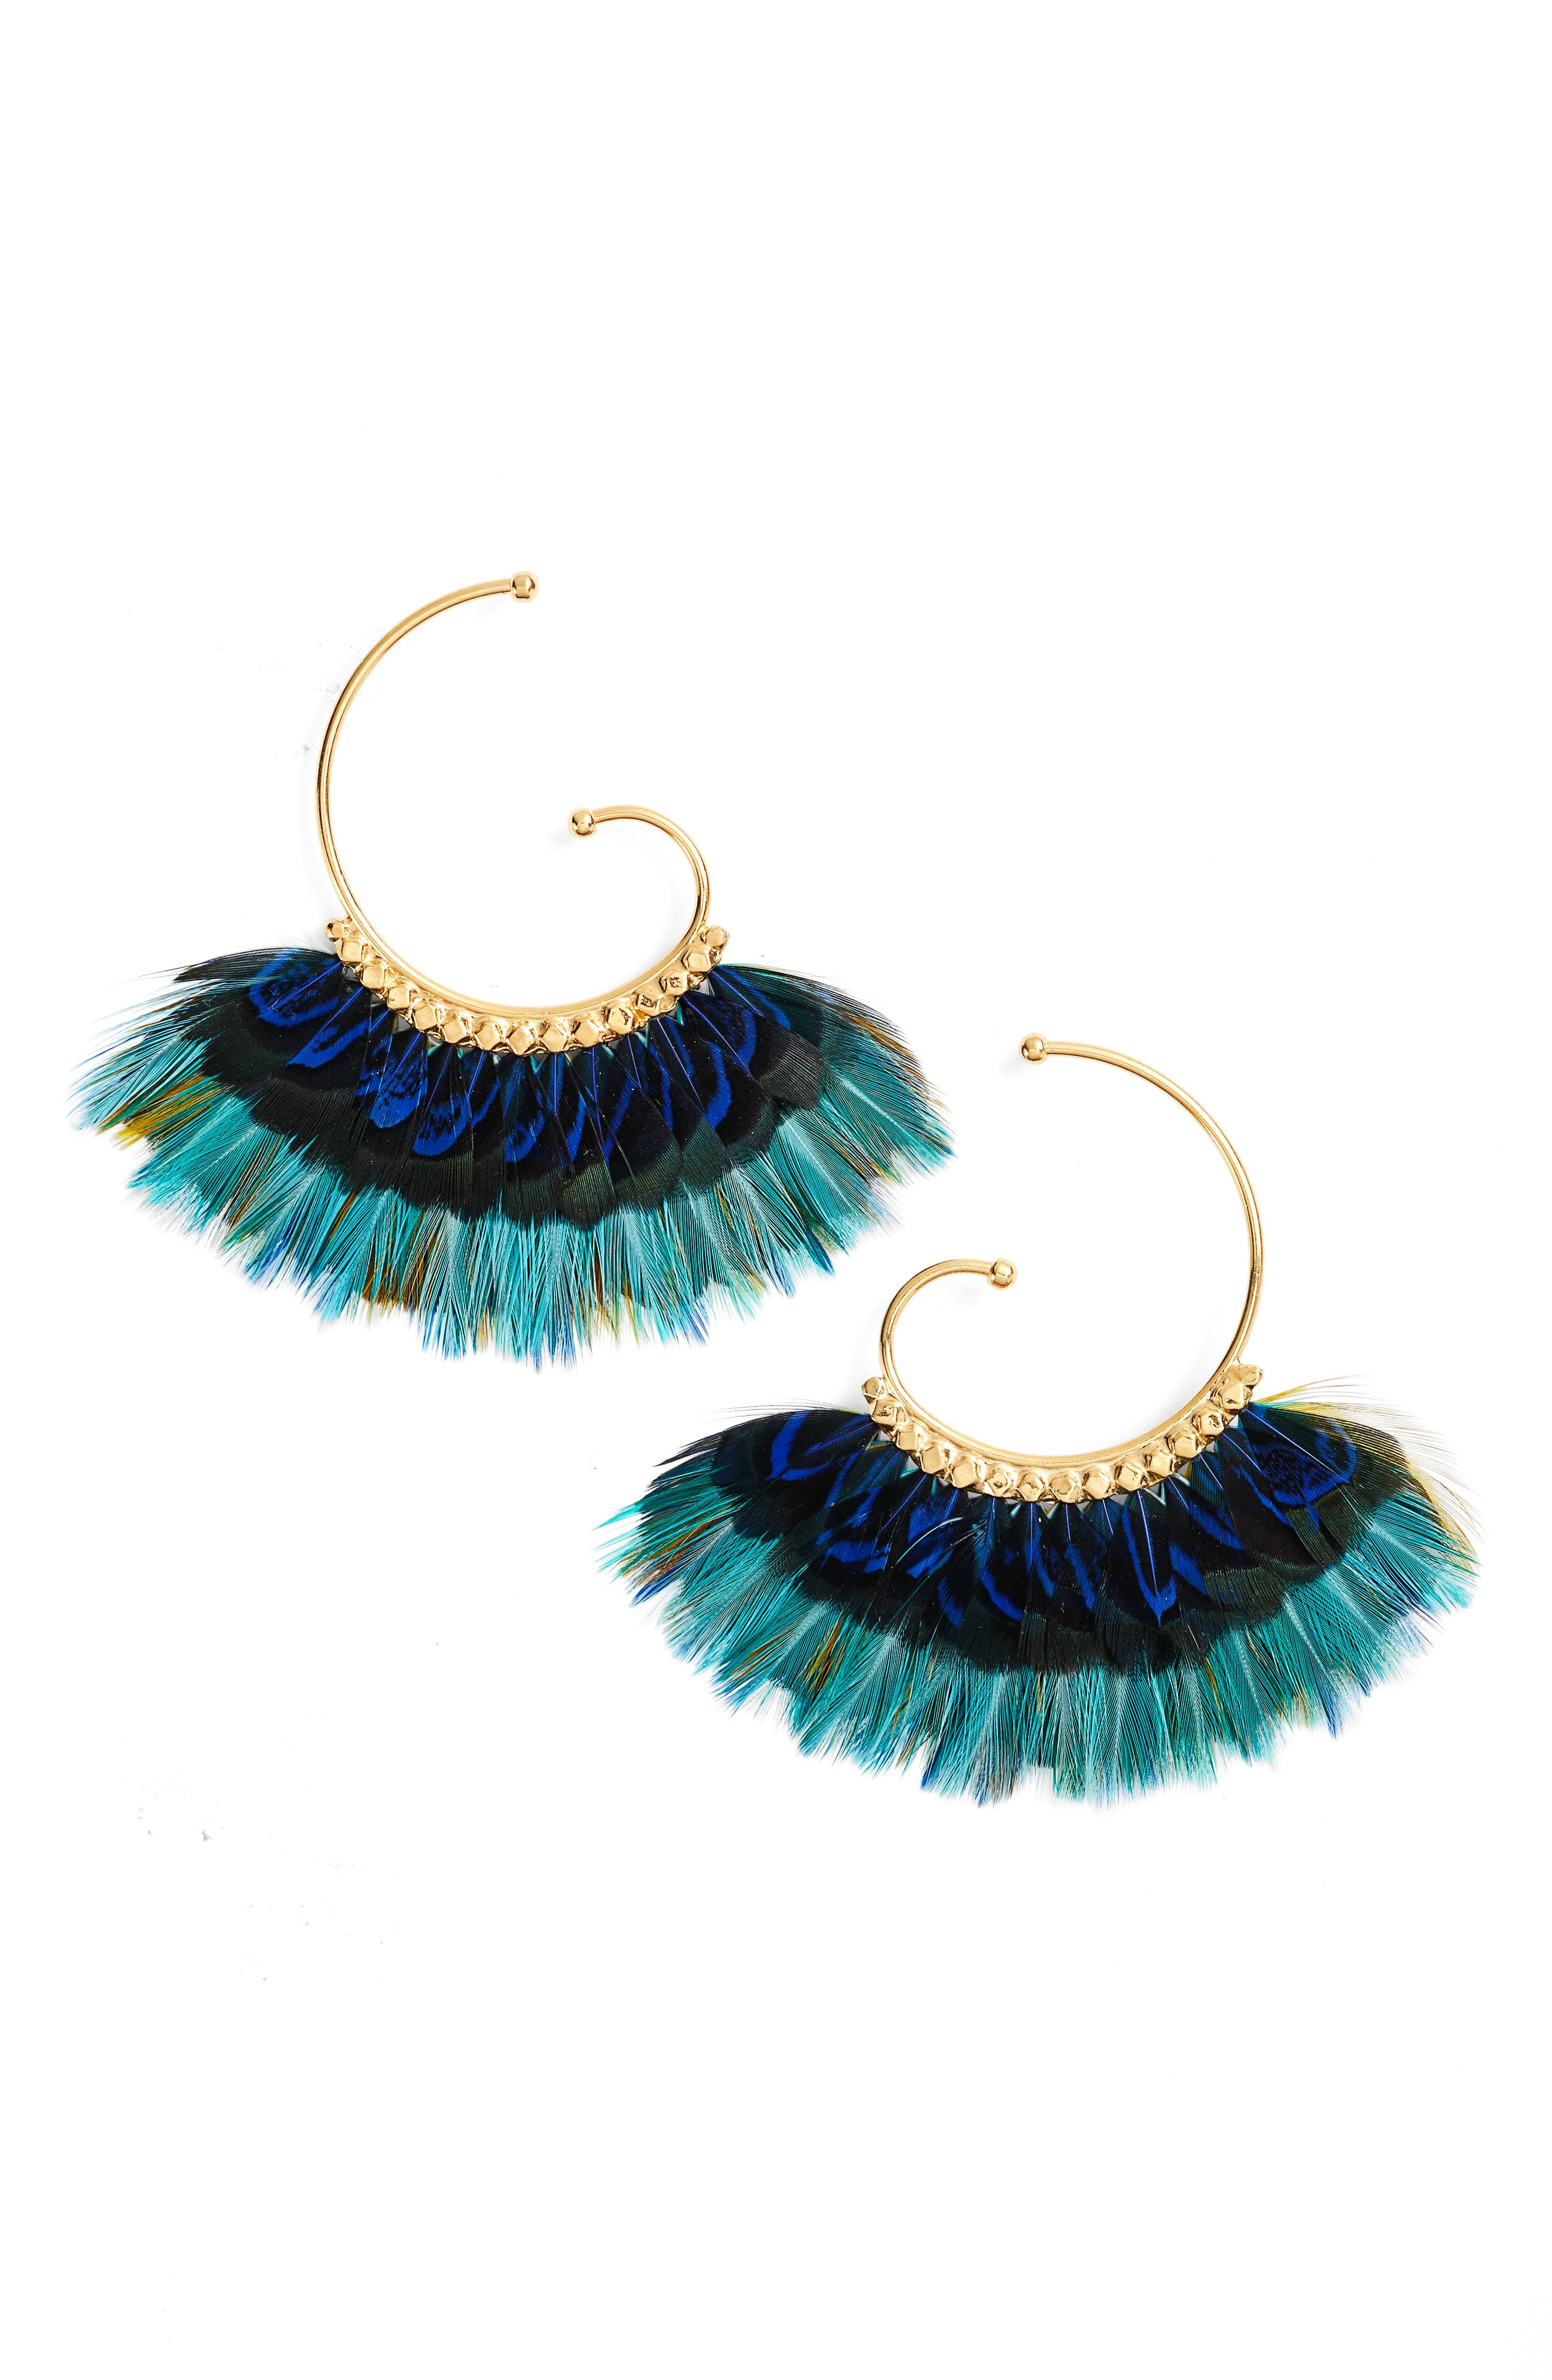 Alternate Image 1 Selected - Gas Bijoux 'Buzios' Feather Earrings